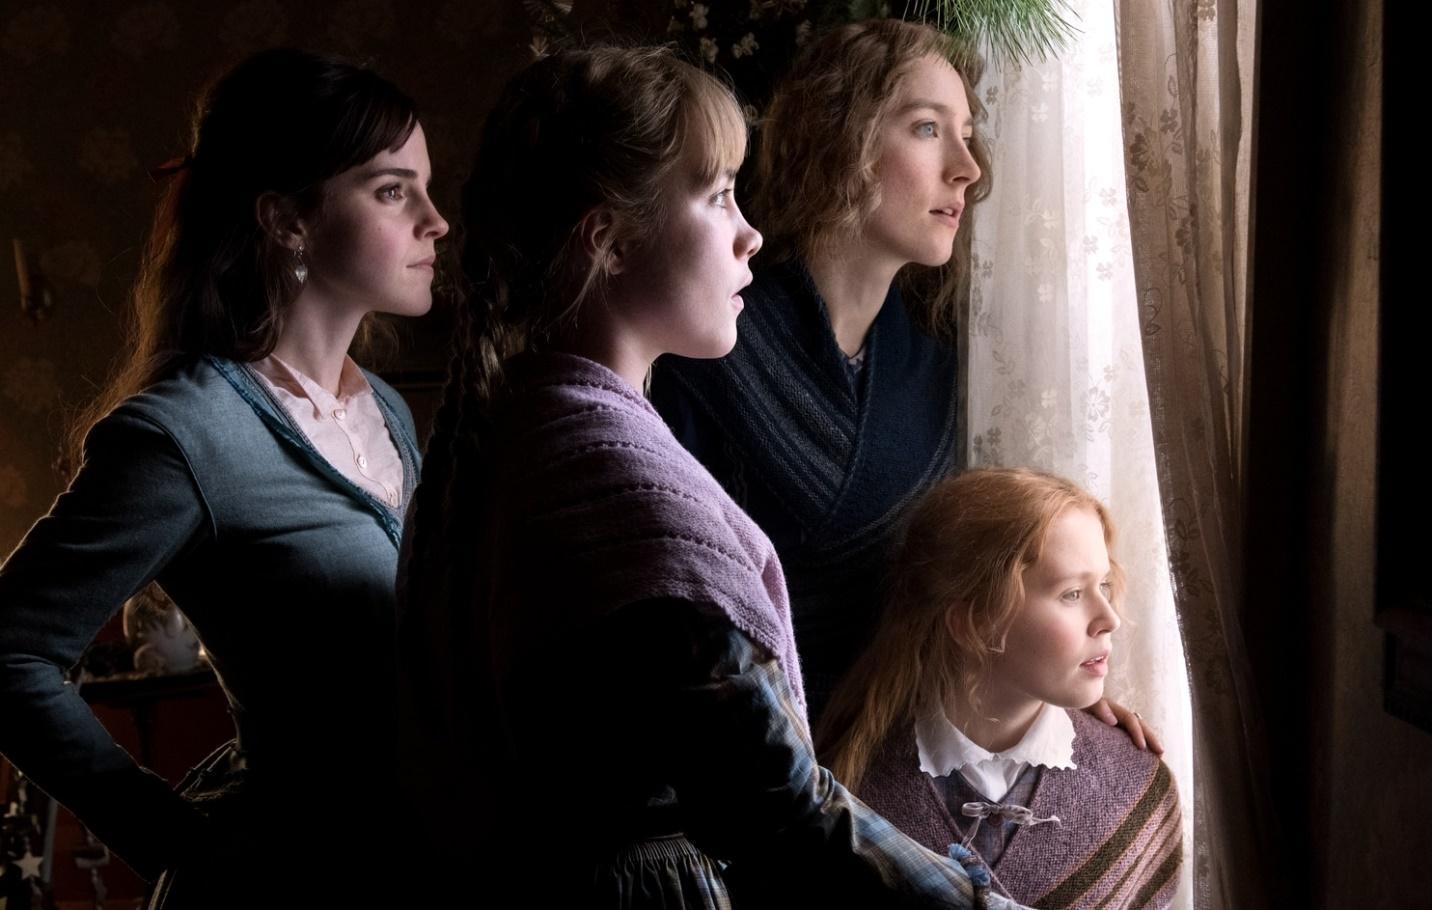 Film still from Little Women, (2019).